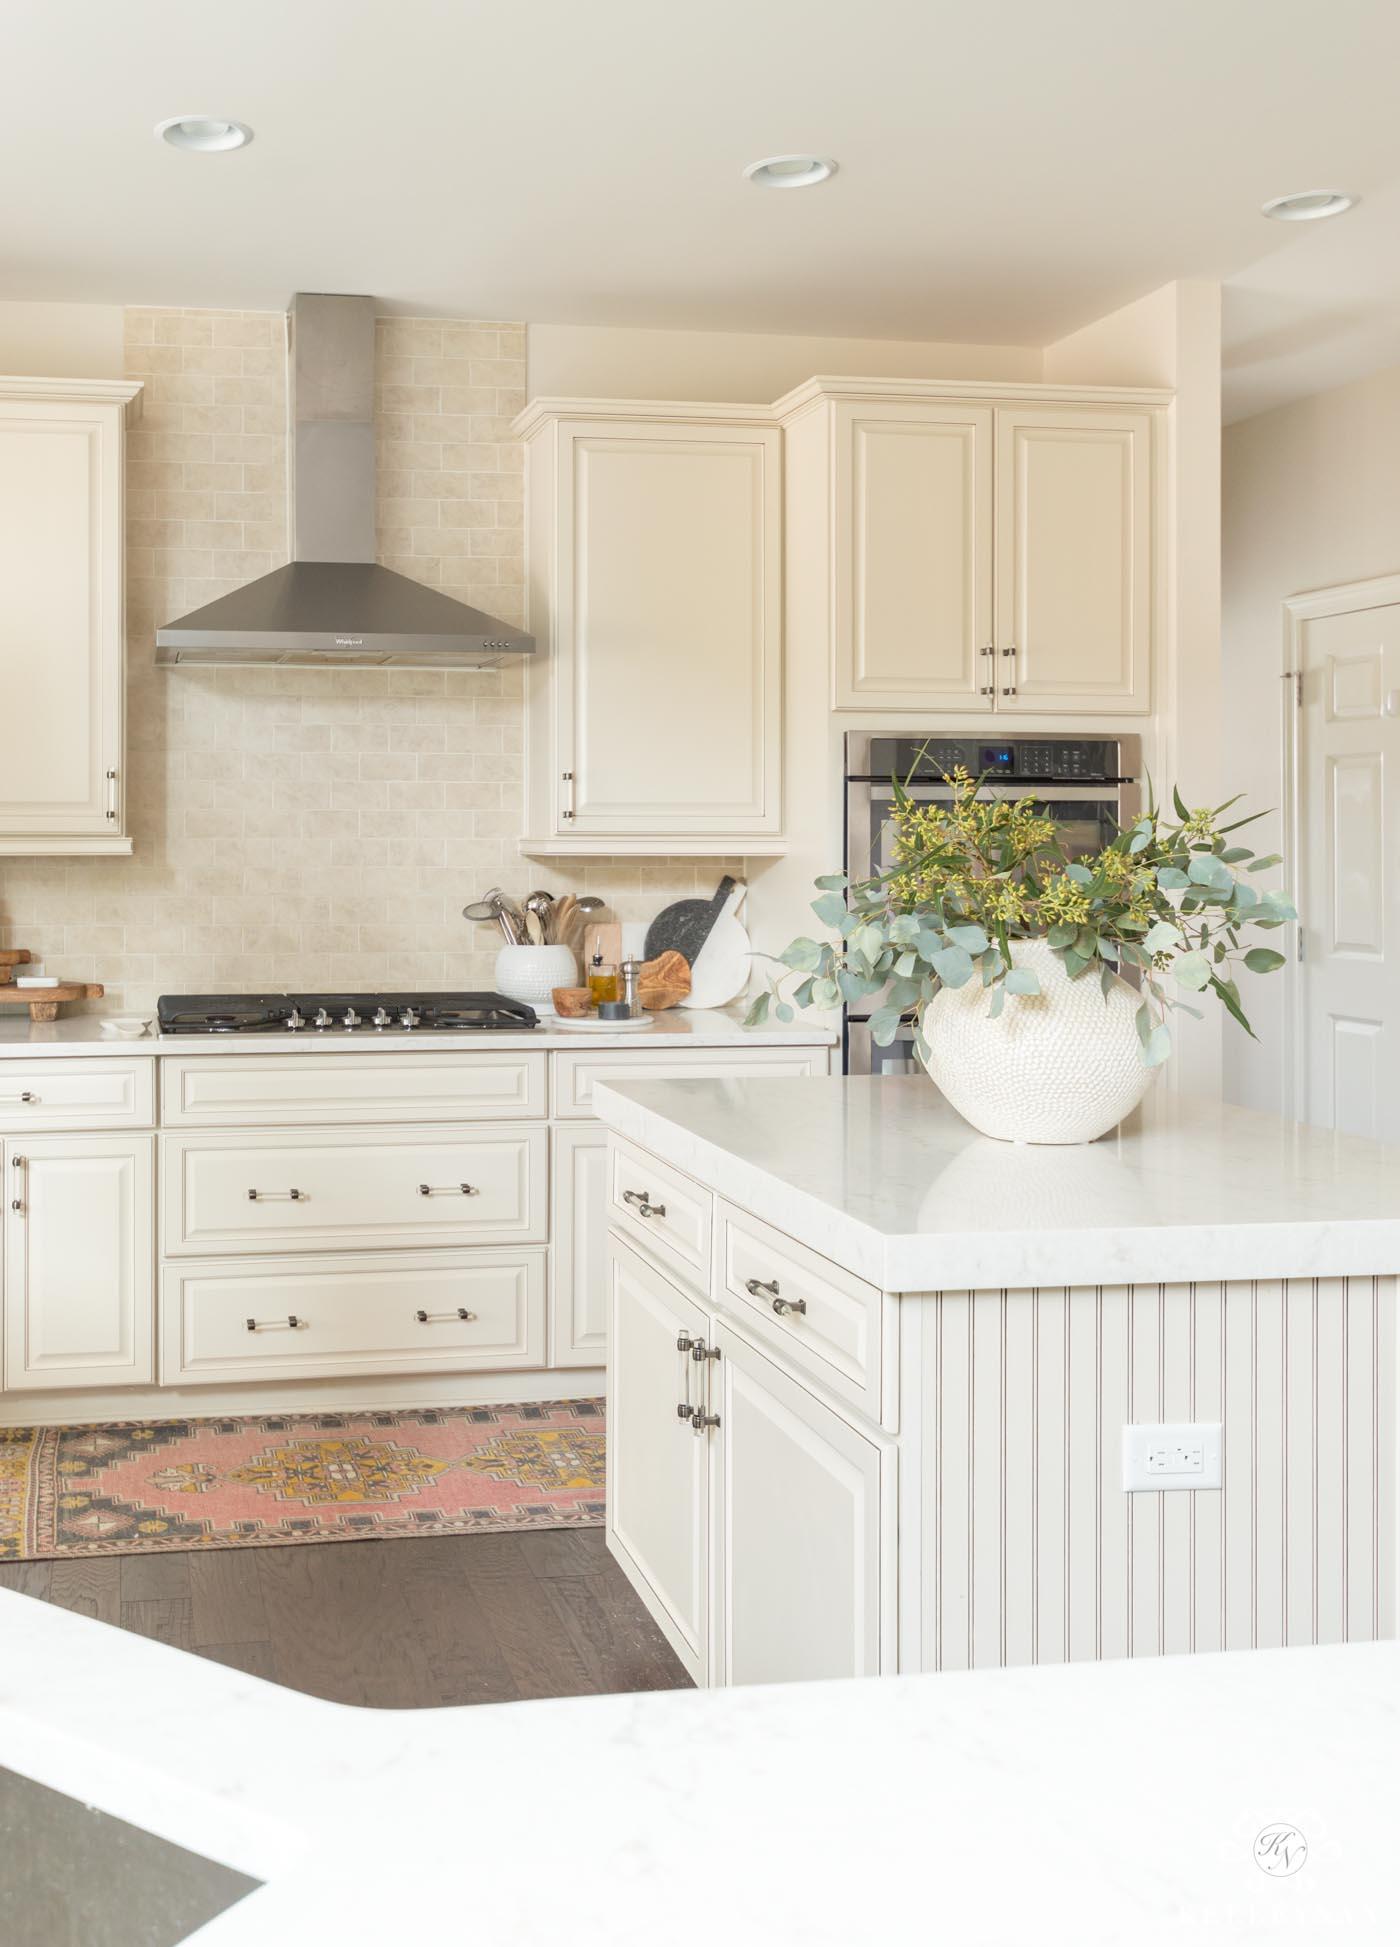 Kitchen Island Decor: 6 Easy Styling Tips | Kelley Nan on Kitchen Counter Decor  id=96984